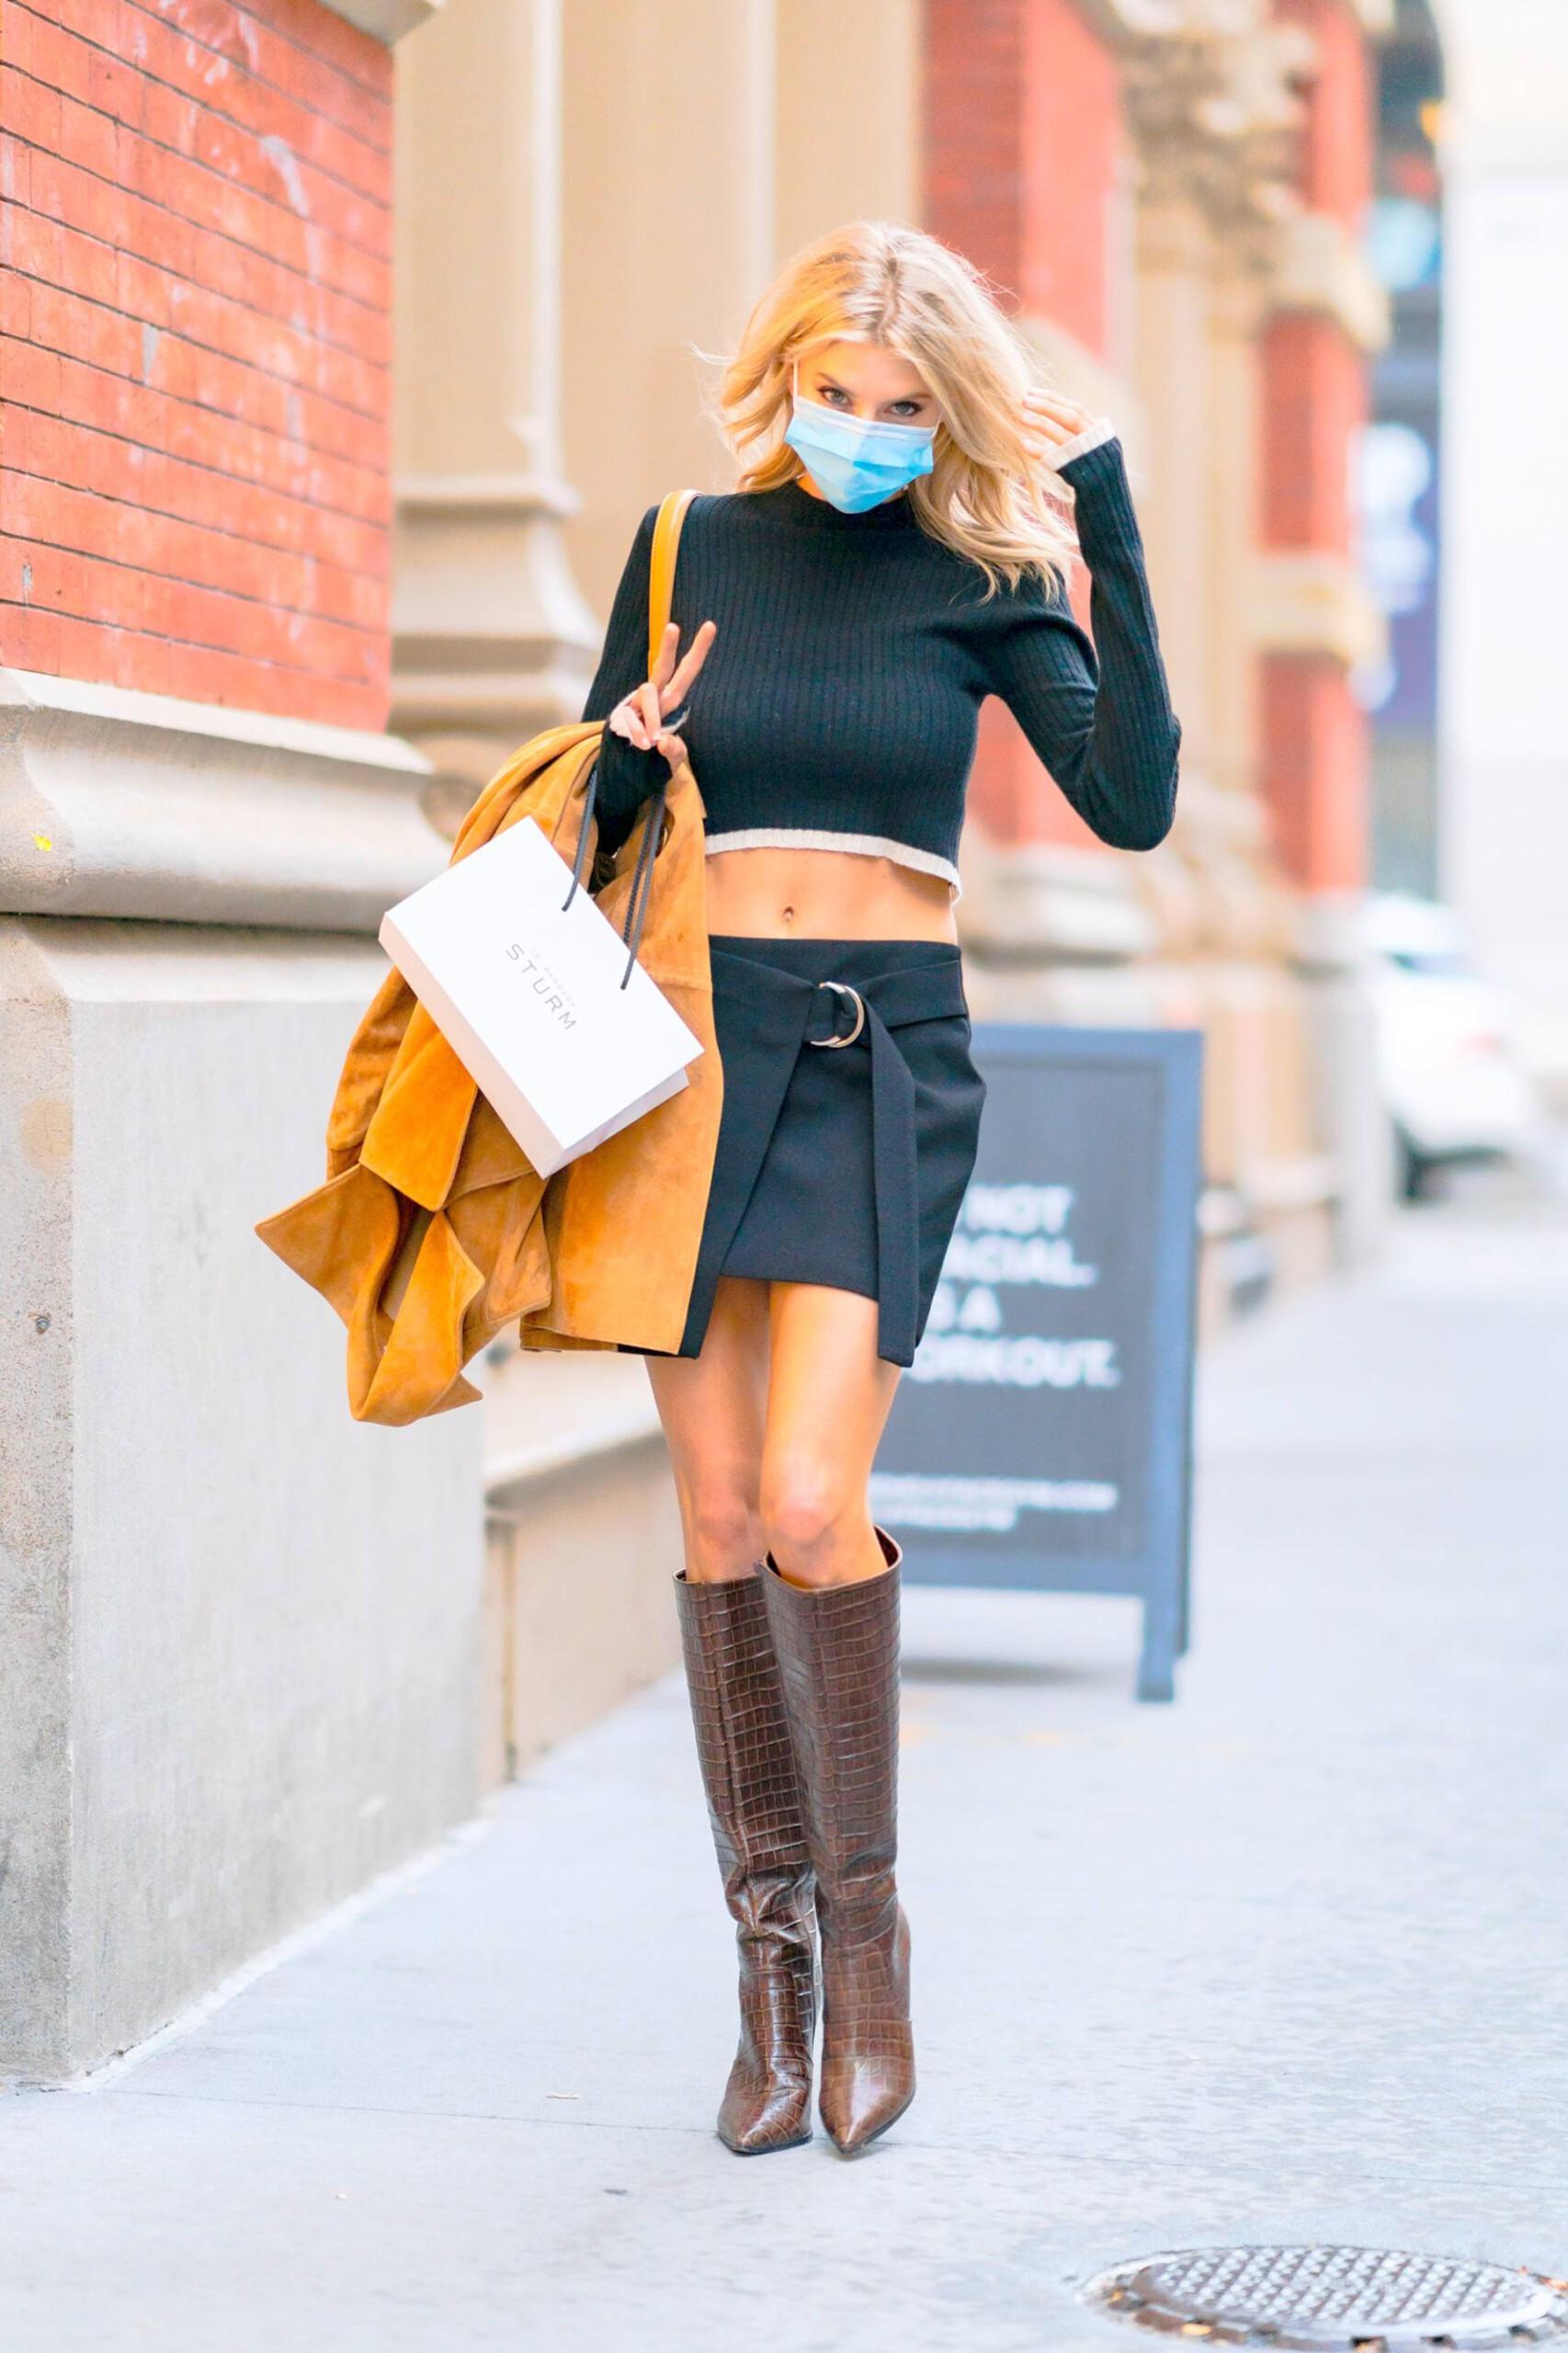 Charlotte Mckinney Sexy Mini Skirt